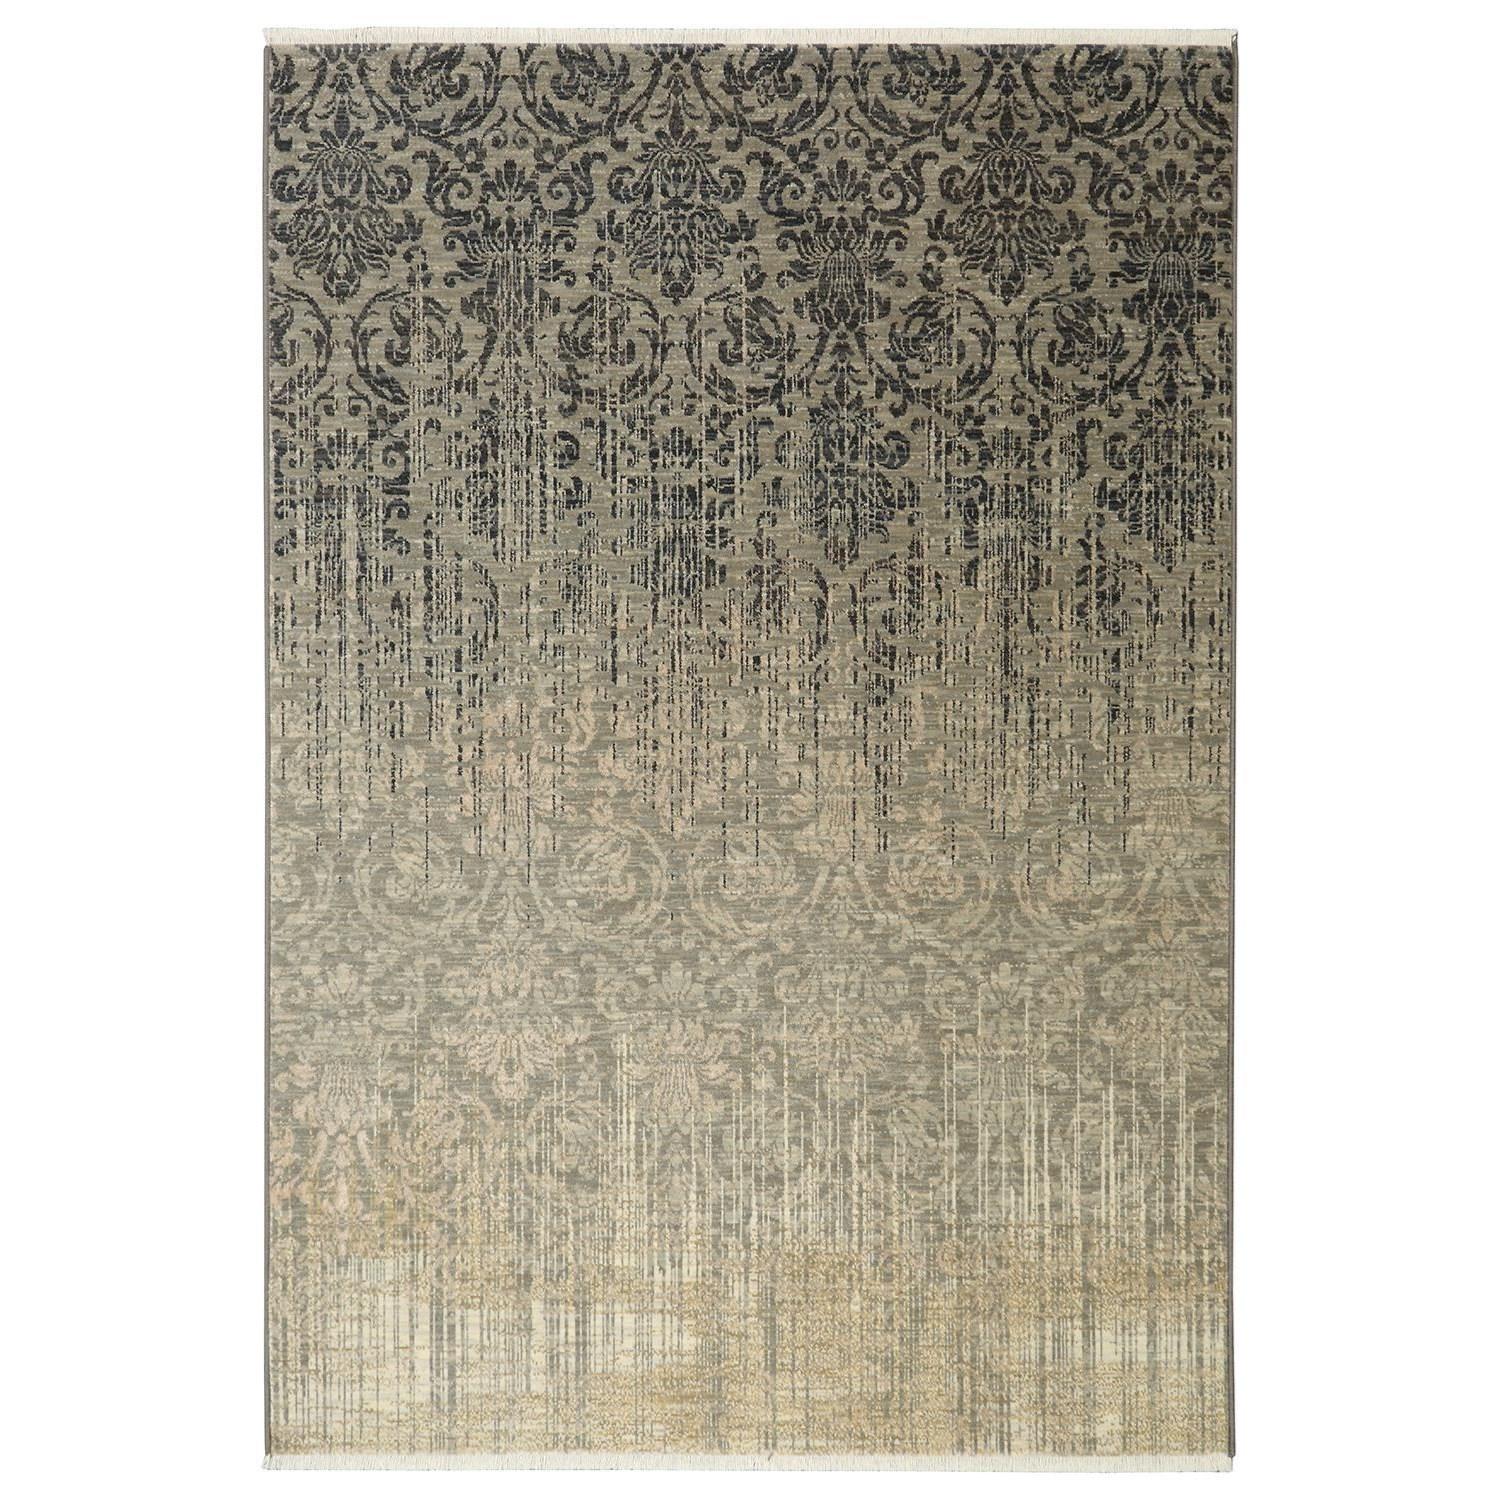 Titanium 8'x11' Tiberio Gray Rug by Karastan Rugs at Darvin Furniture